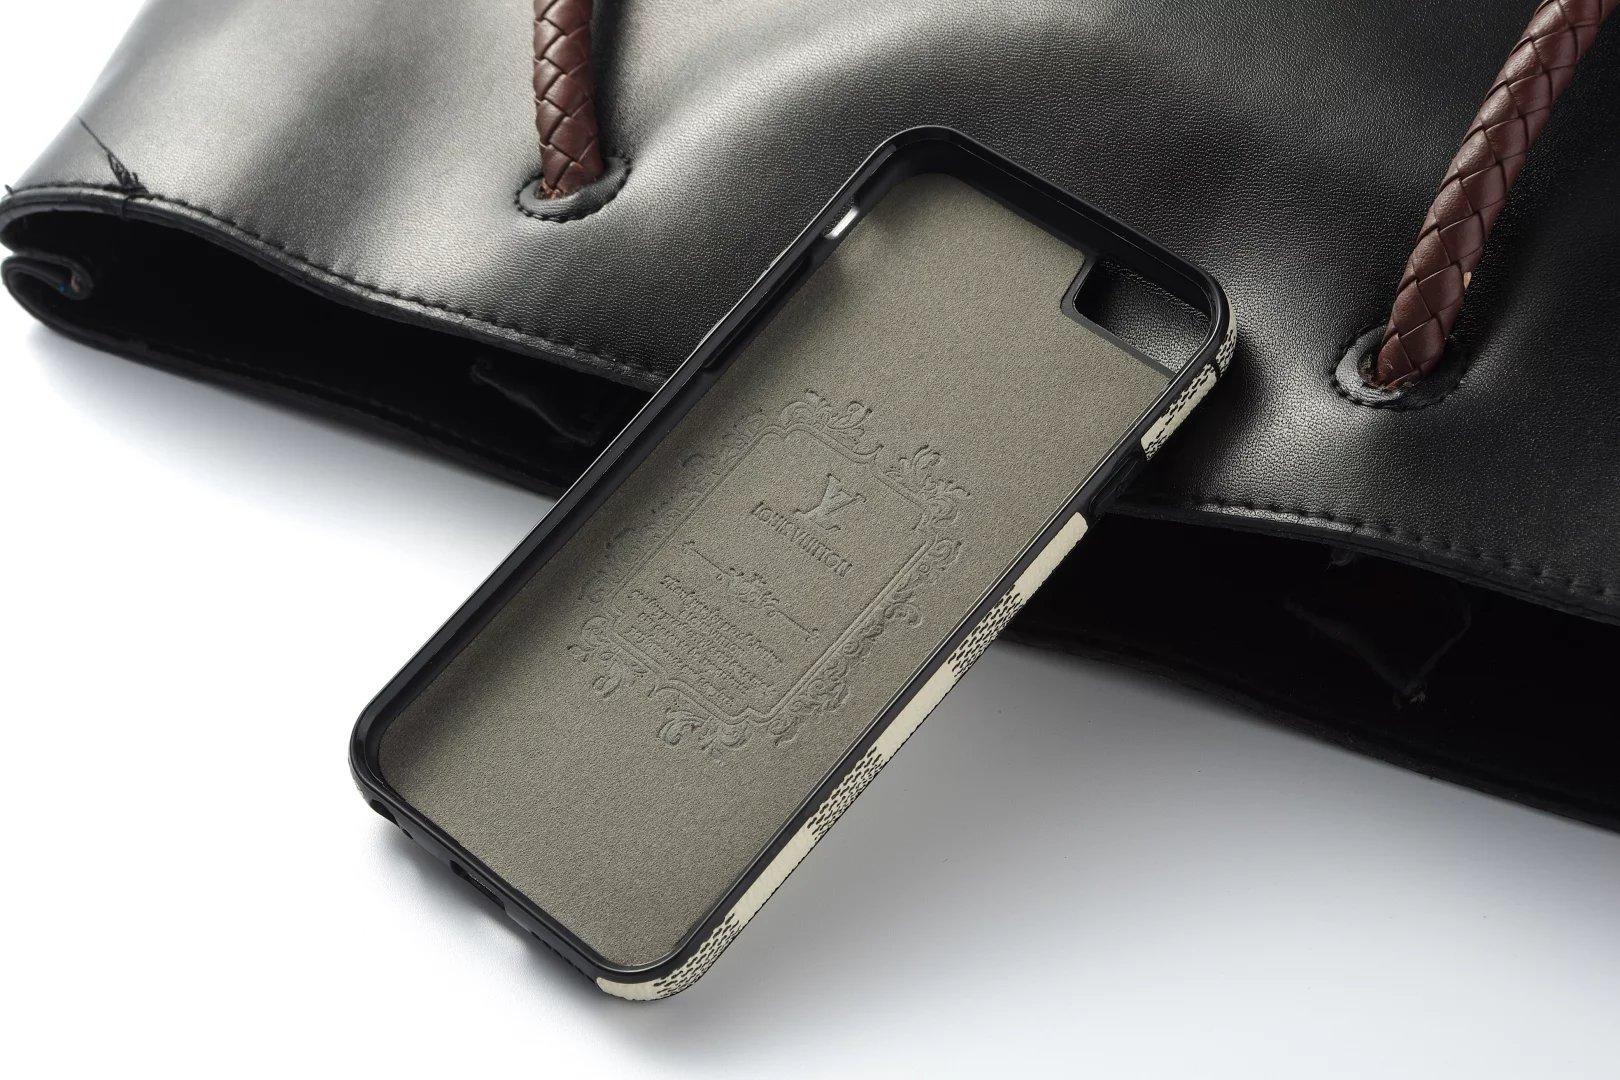 eigene iphone hülle erstellen iphone hülle kaufen Gucci iphone6s hülle iphone s 6s hülle handy cover 6slber machen design iphone hülle eifon 3 hülle i phone iphone 6s hülle gold